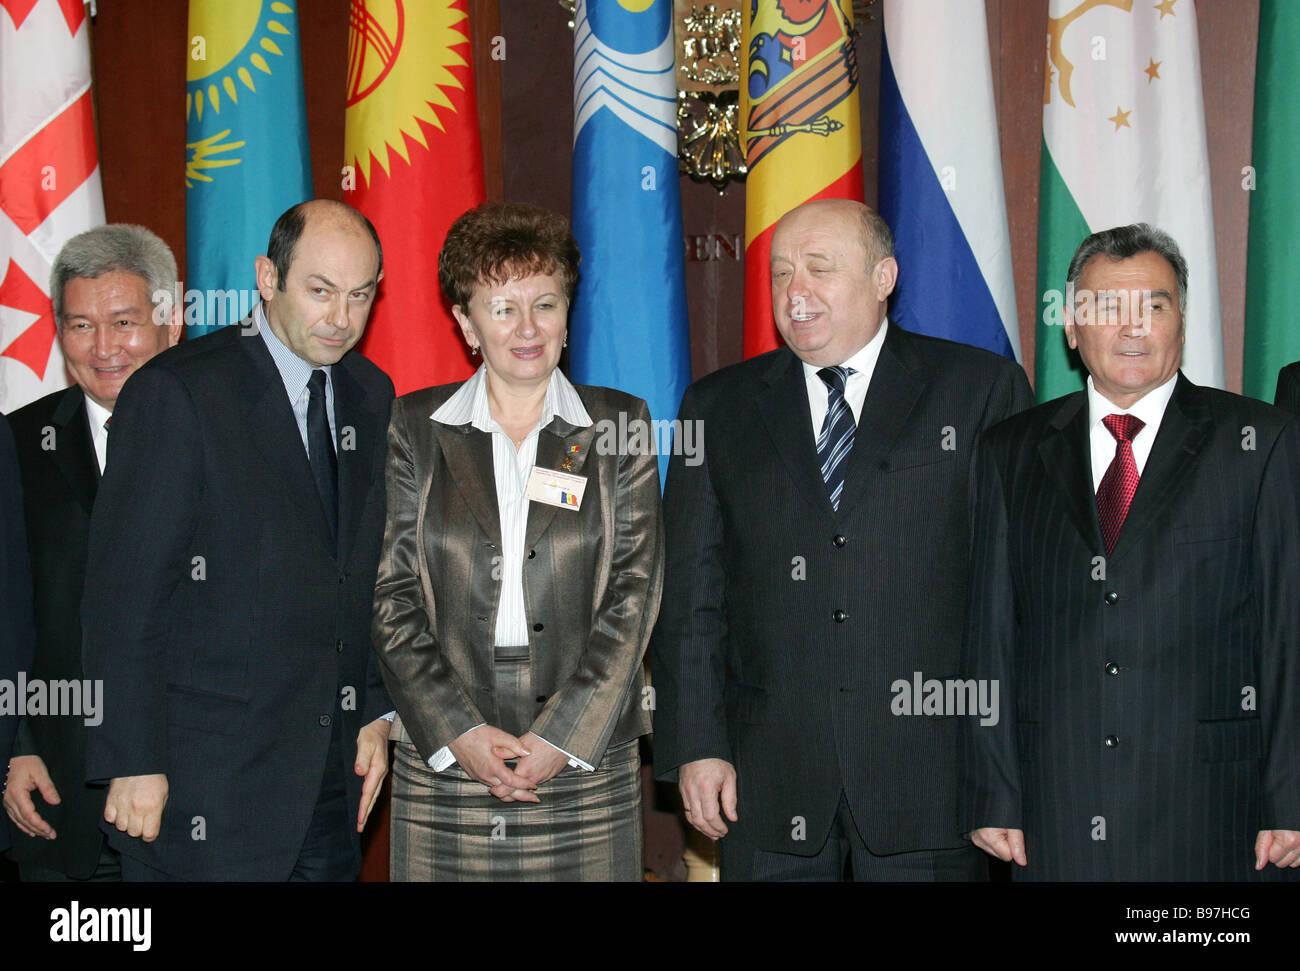 Prime Minister of Kyrgyzstan Felix Kulov CIS Executive Secretary Vladimir Rushailo Vice Premier of the Republic - Stock Image